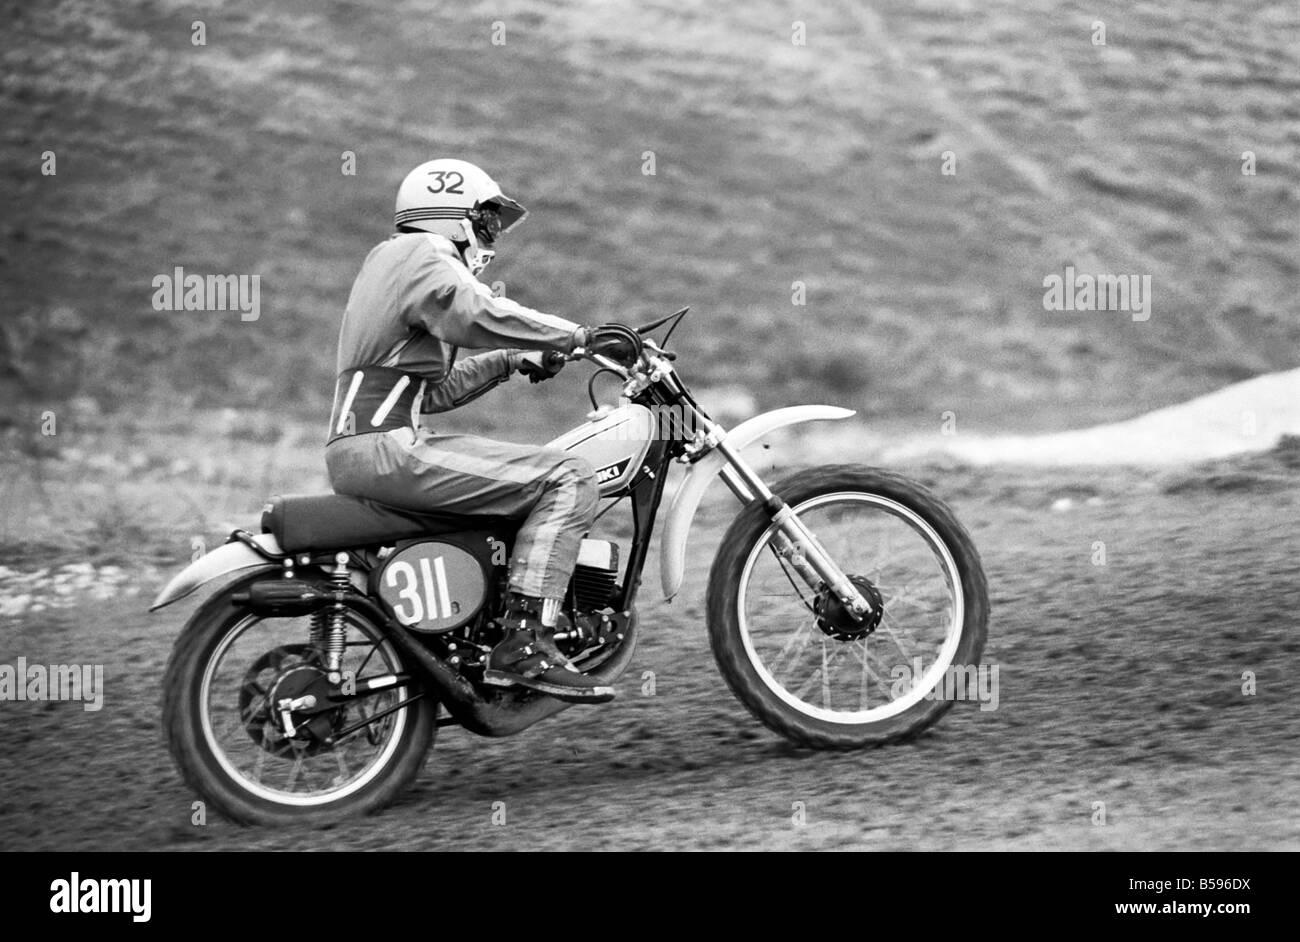 Motorsport/Children/Motorbike: Schoolboys Scramble. March 1975 75-01212-019 - Stock Image